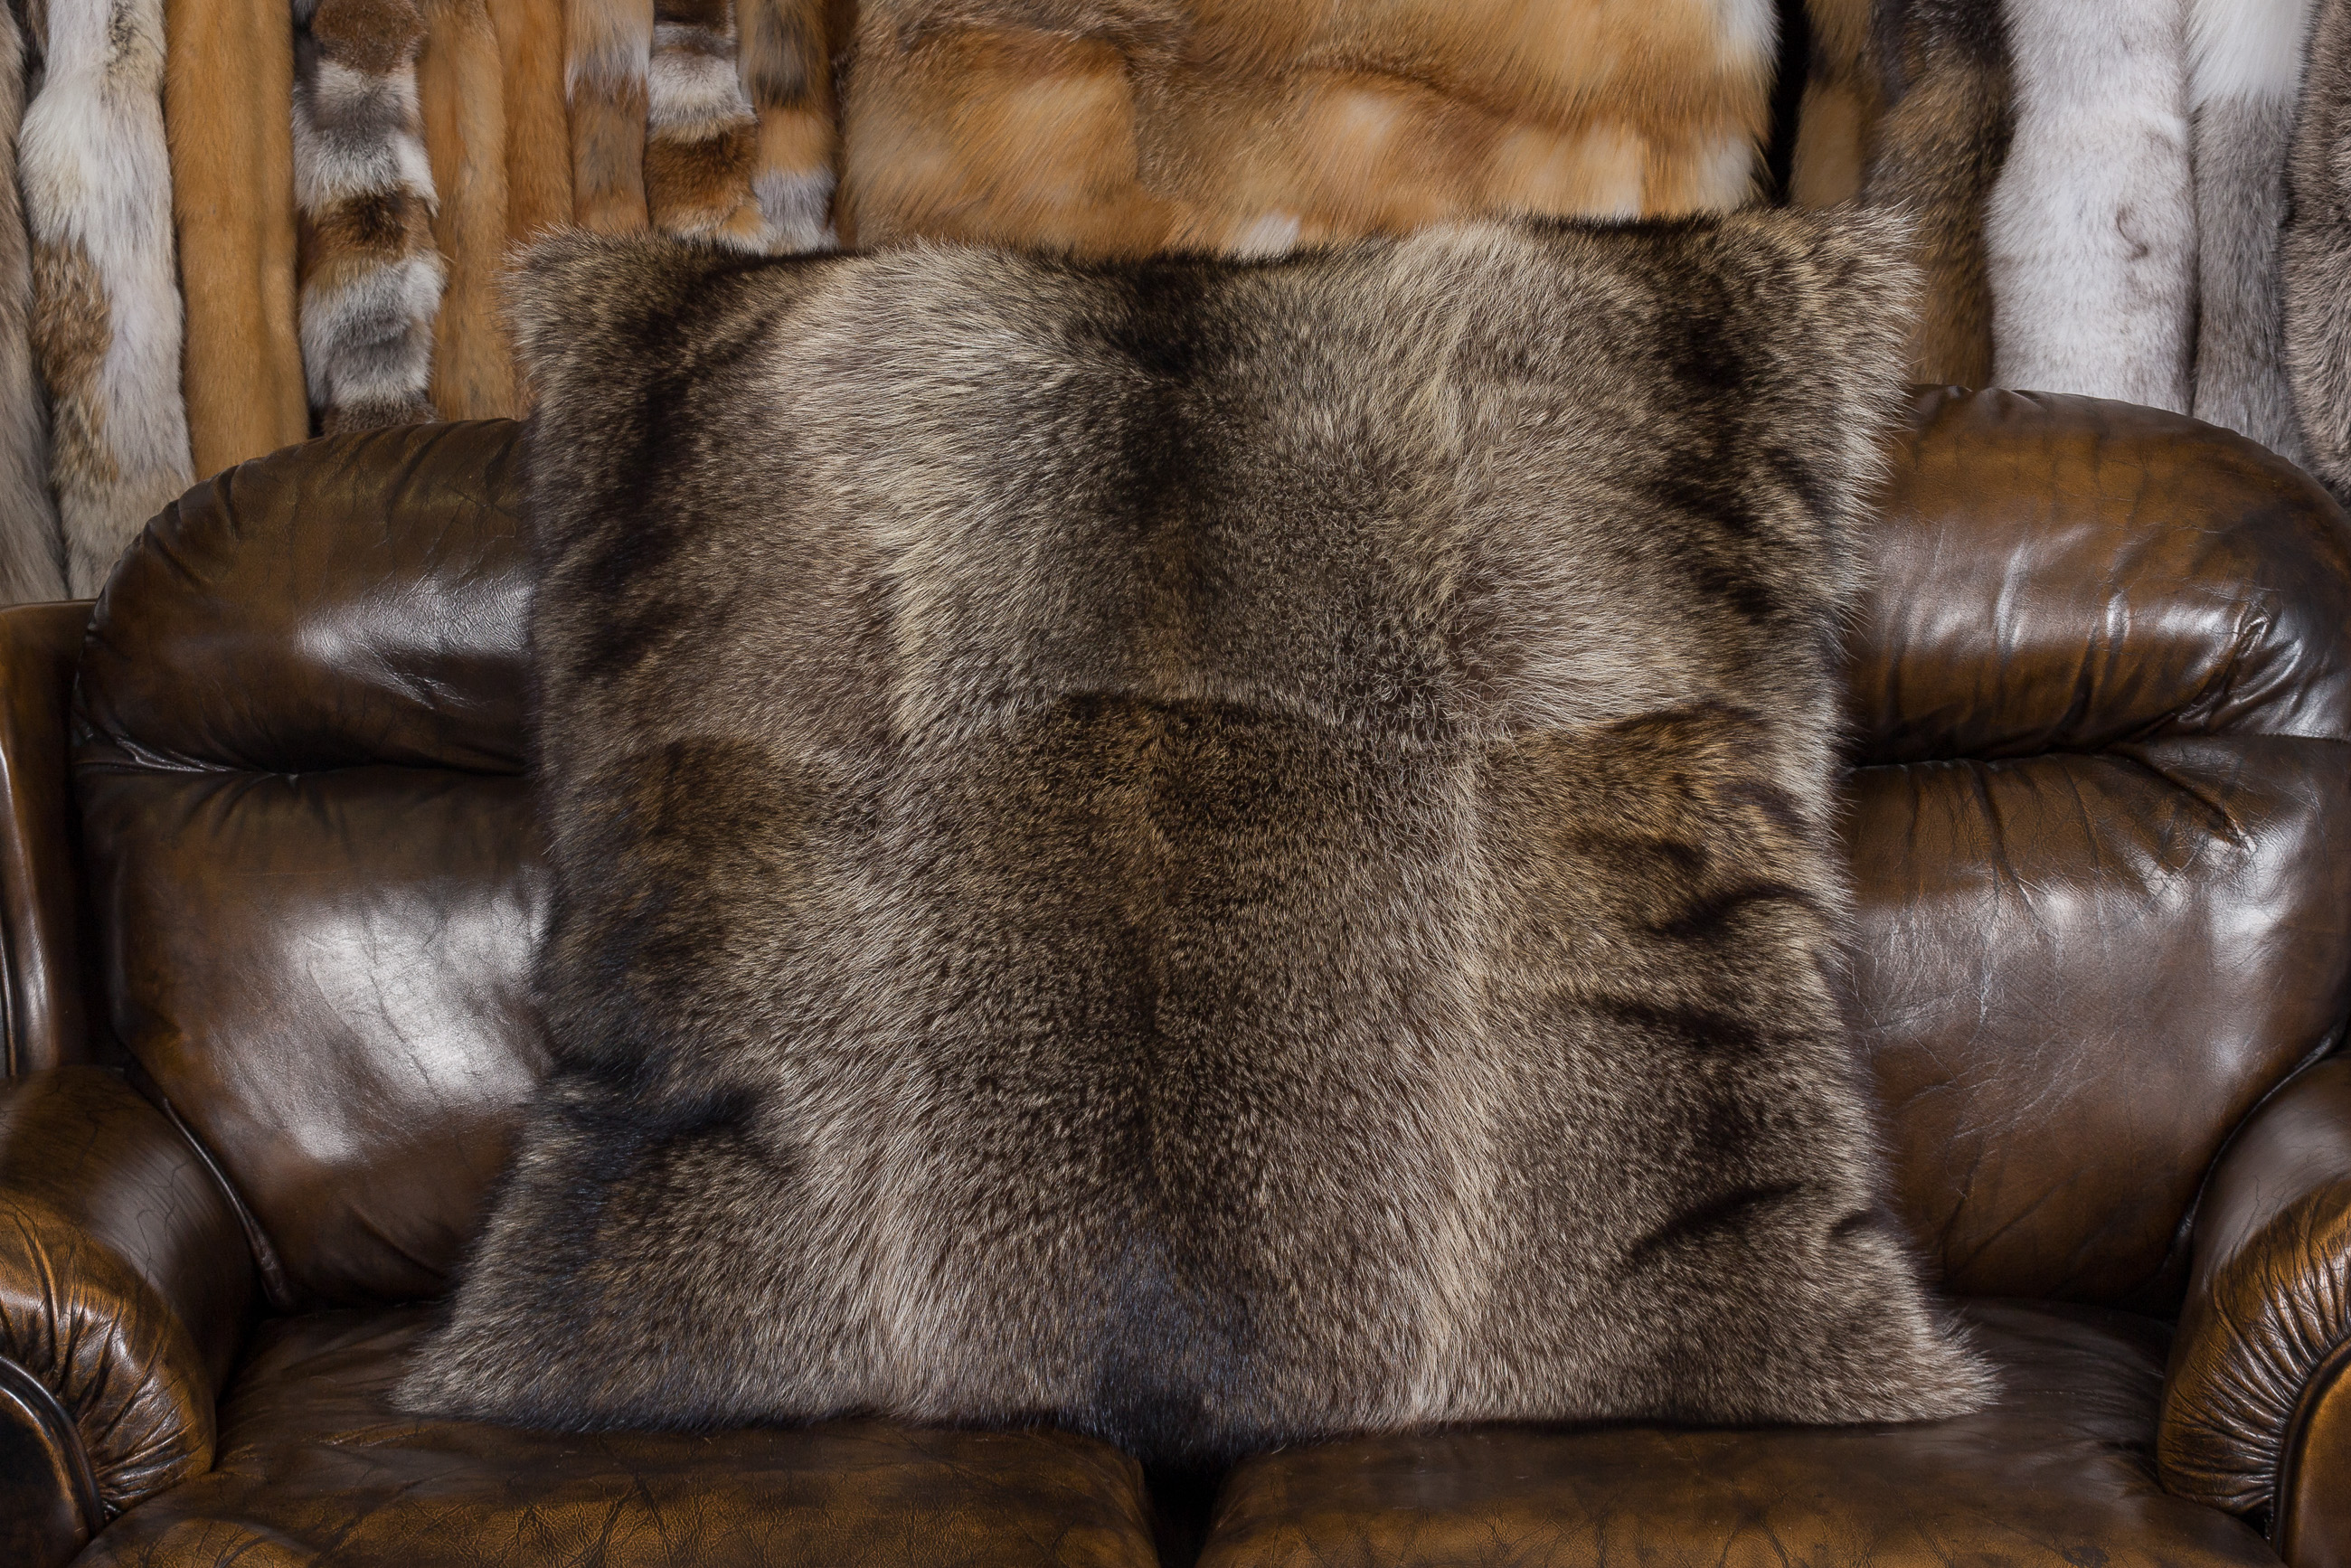 gro es kanadisches waschb r pelzkissen lars paustian in kiel. Black Bedroom Furniture Sets. Home Design Ideas